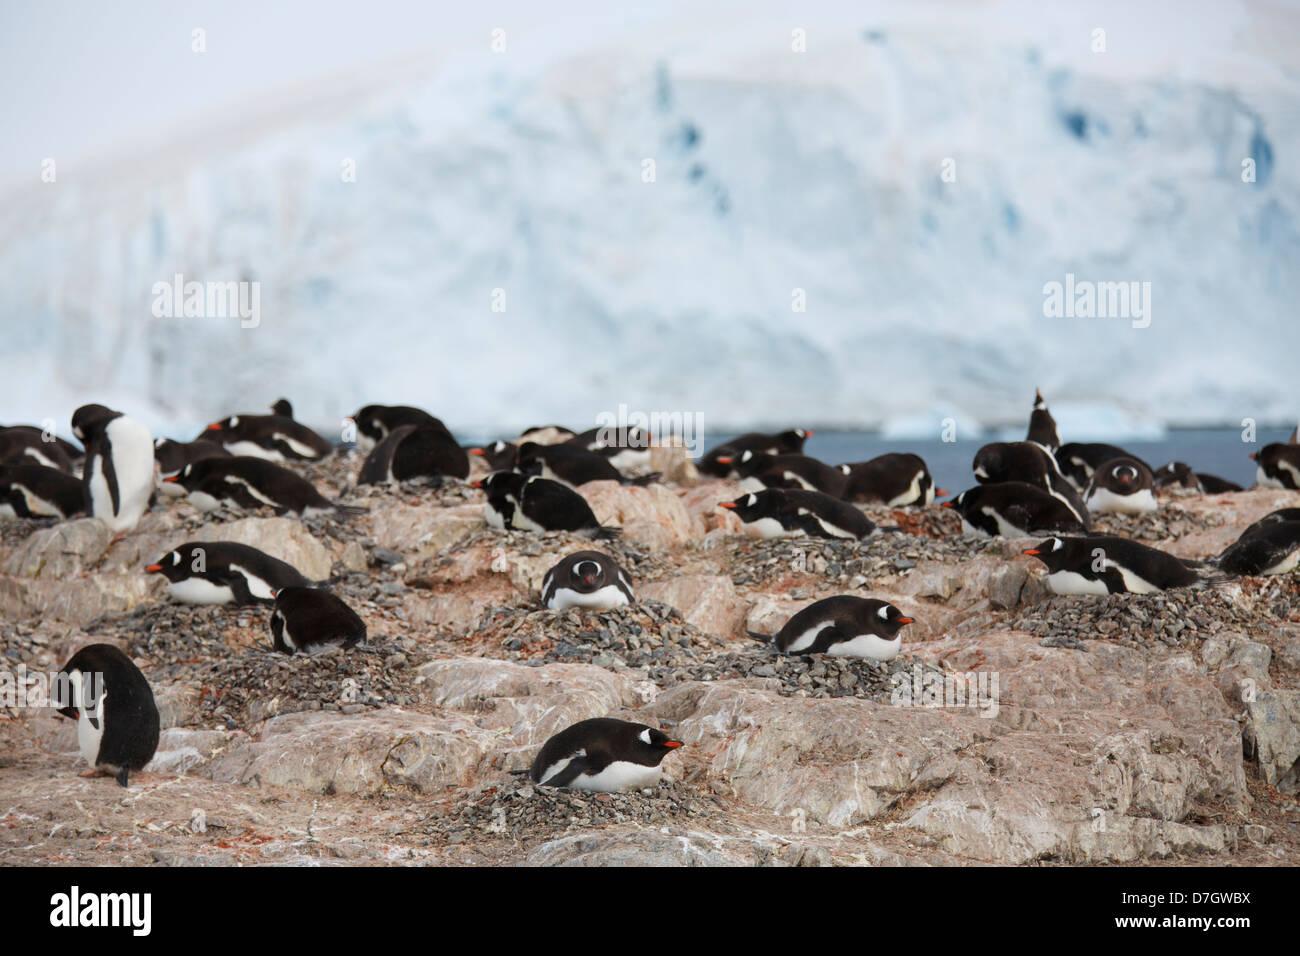 A Gentoo Penguin colony (Pygoscelis papua) on Cuverville Island, Antarctica. - Stock Image